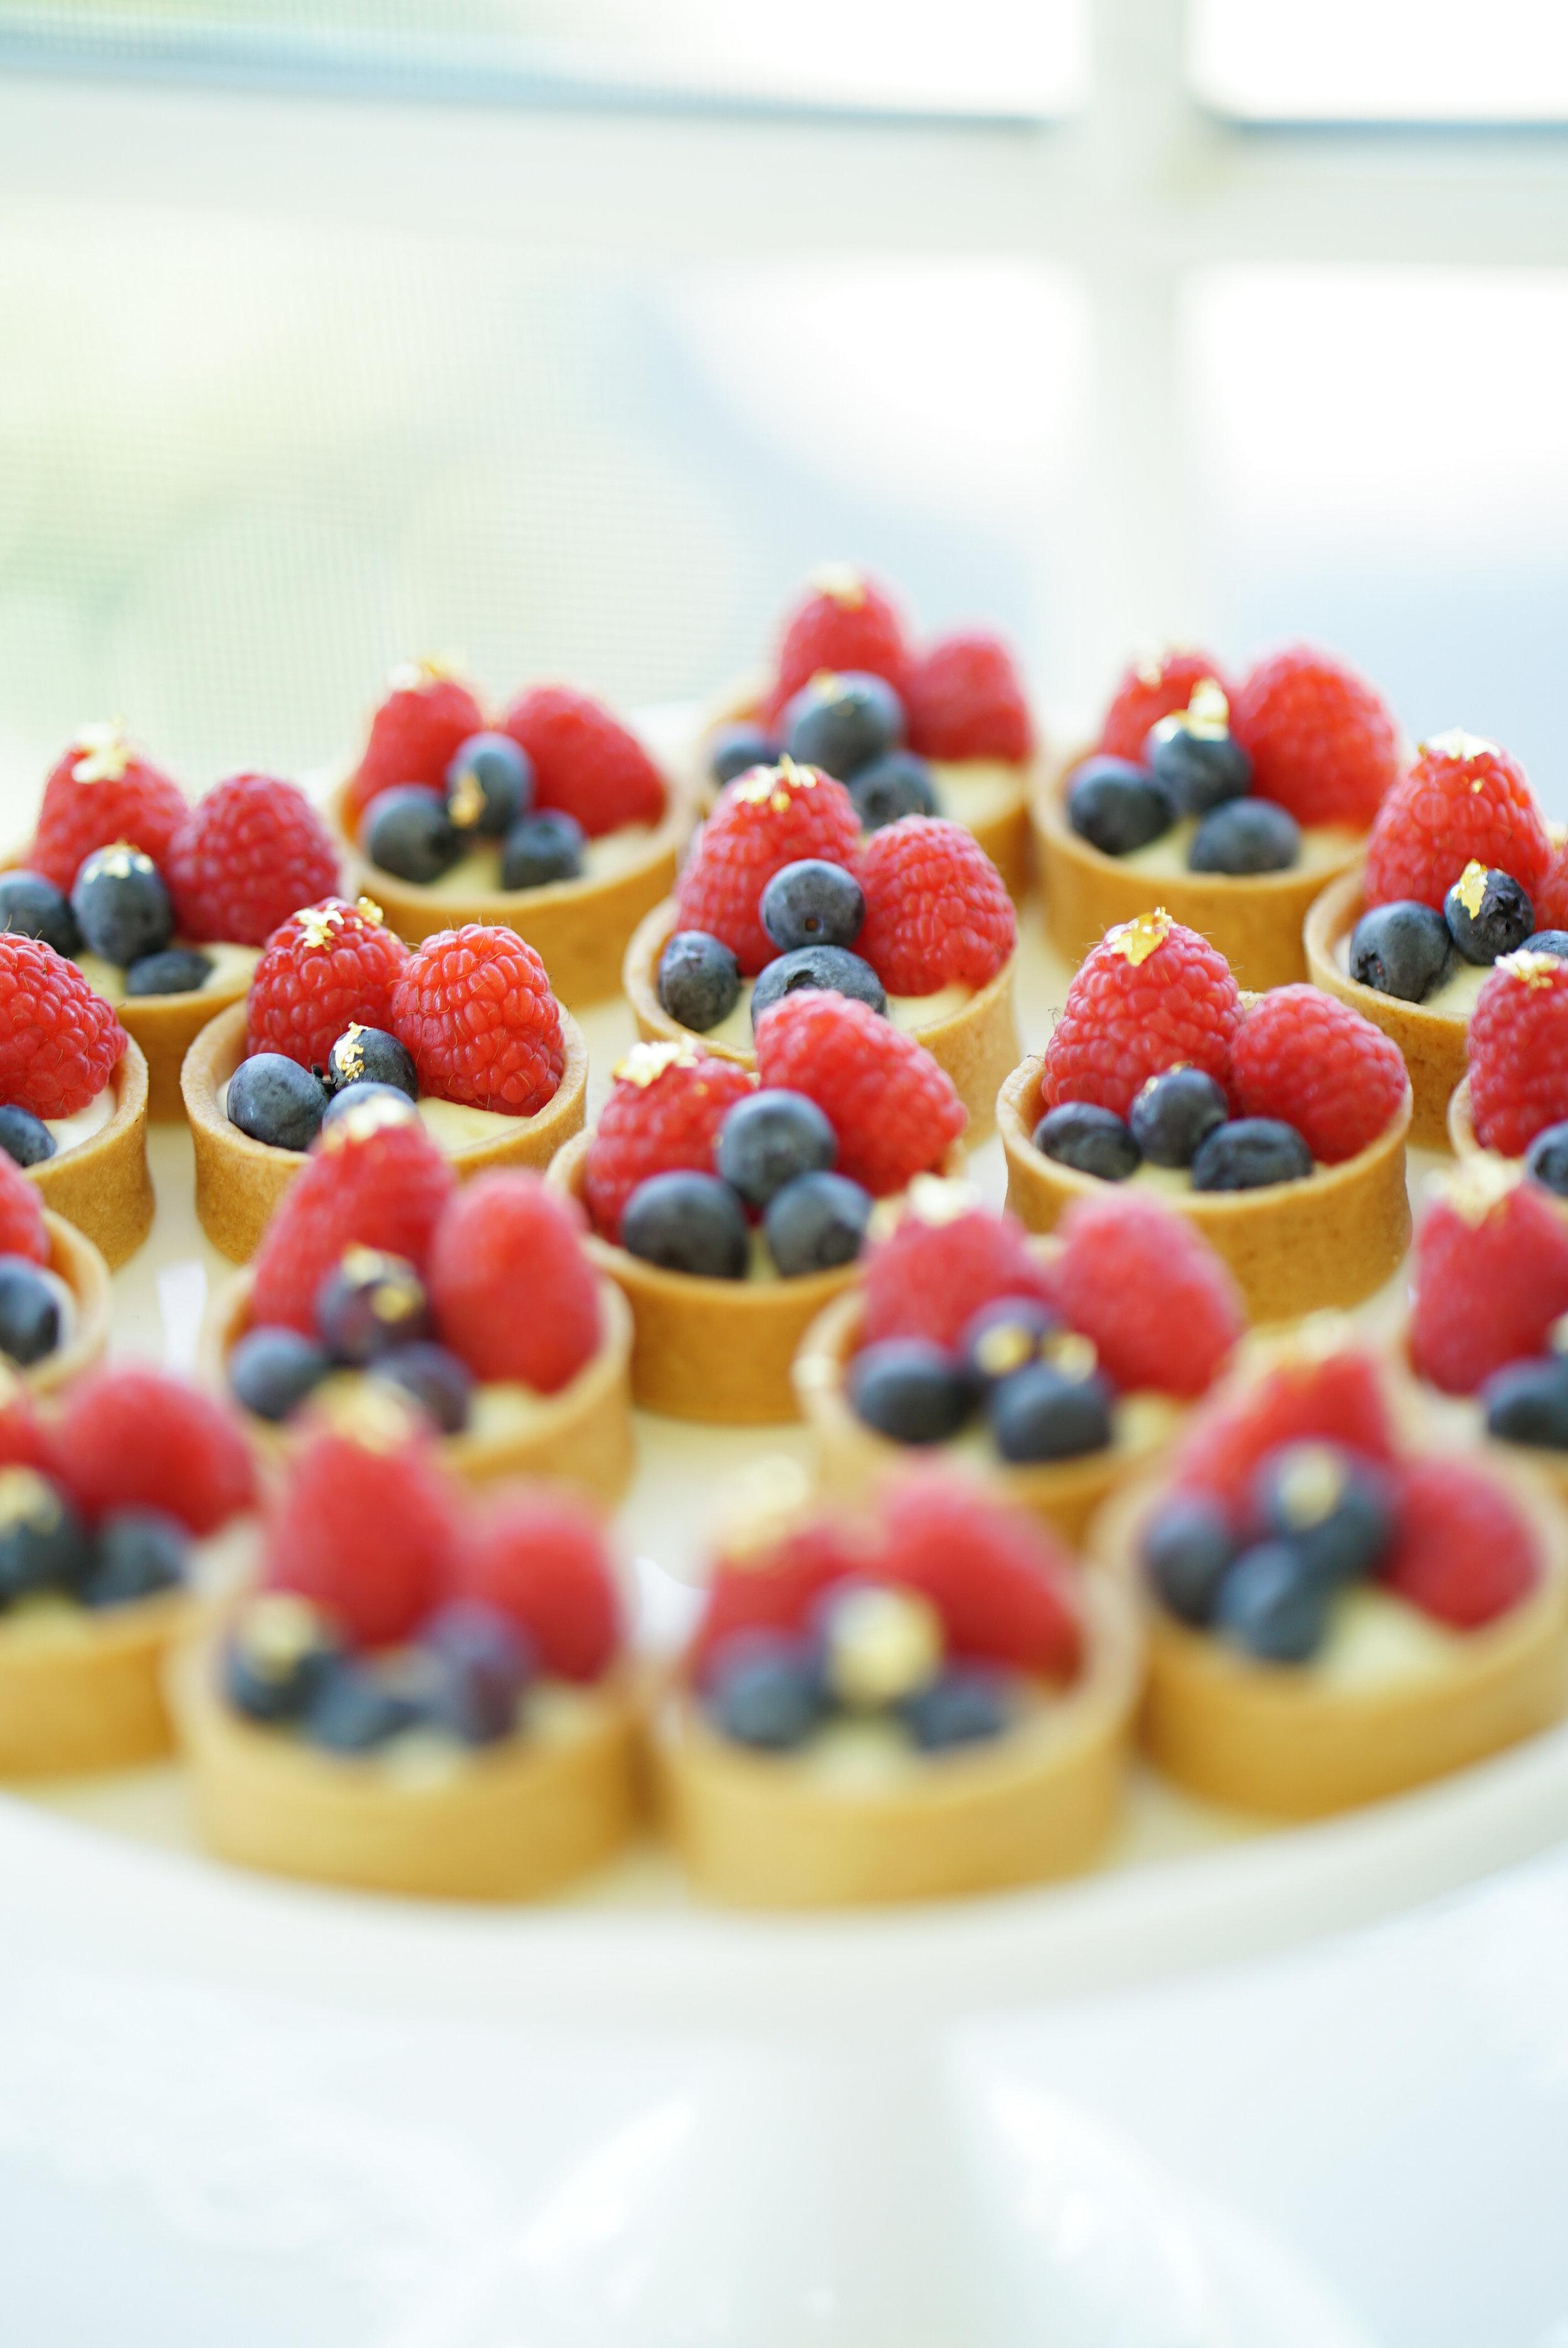 Hemsley 10.2.16 Minikhada fruit tart (1 of 1).jpg